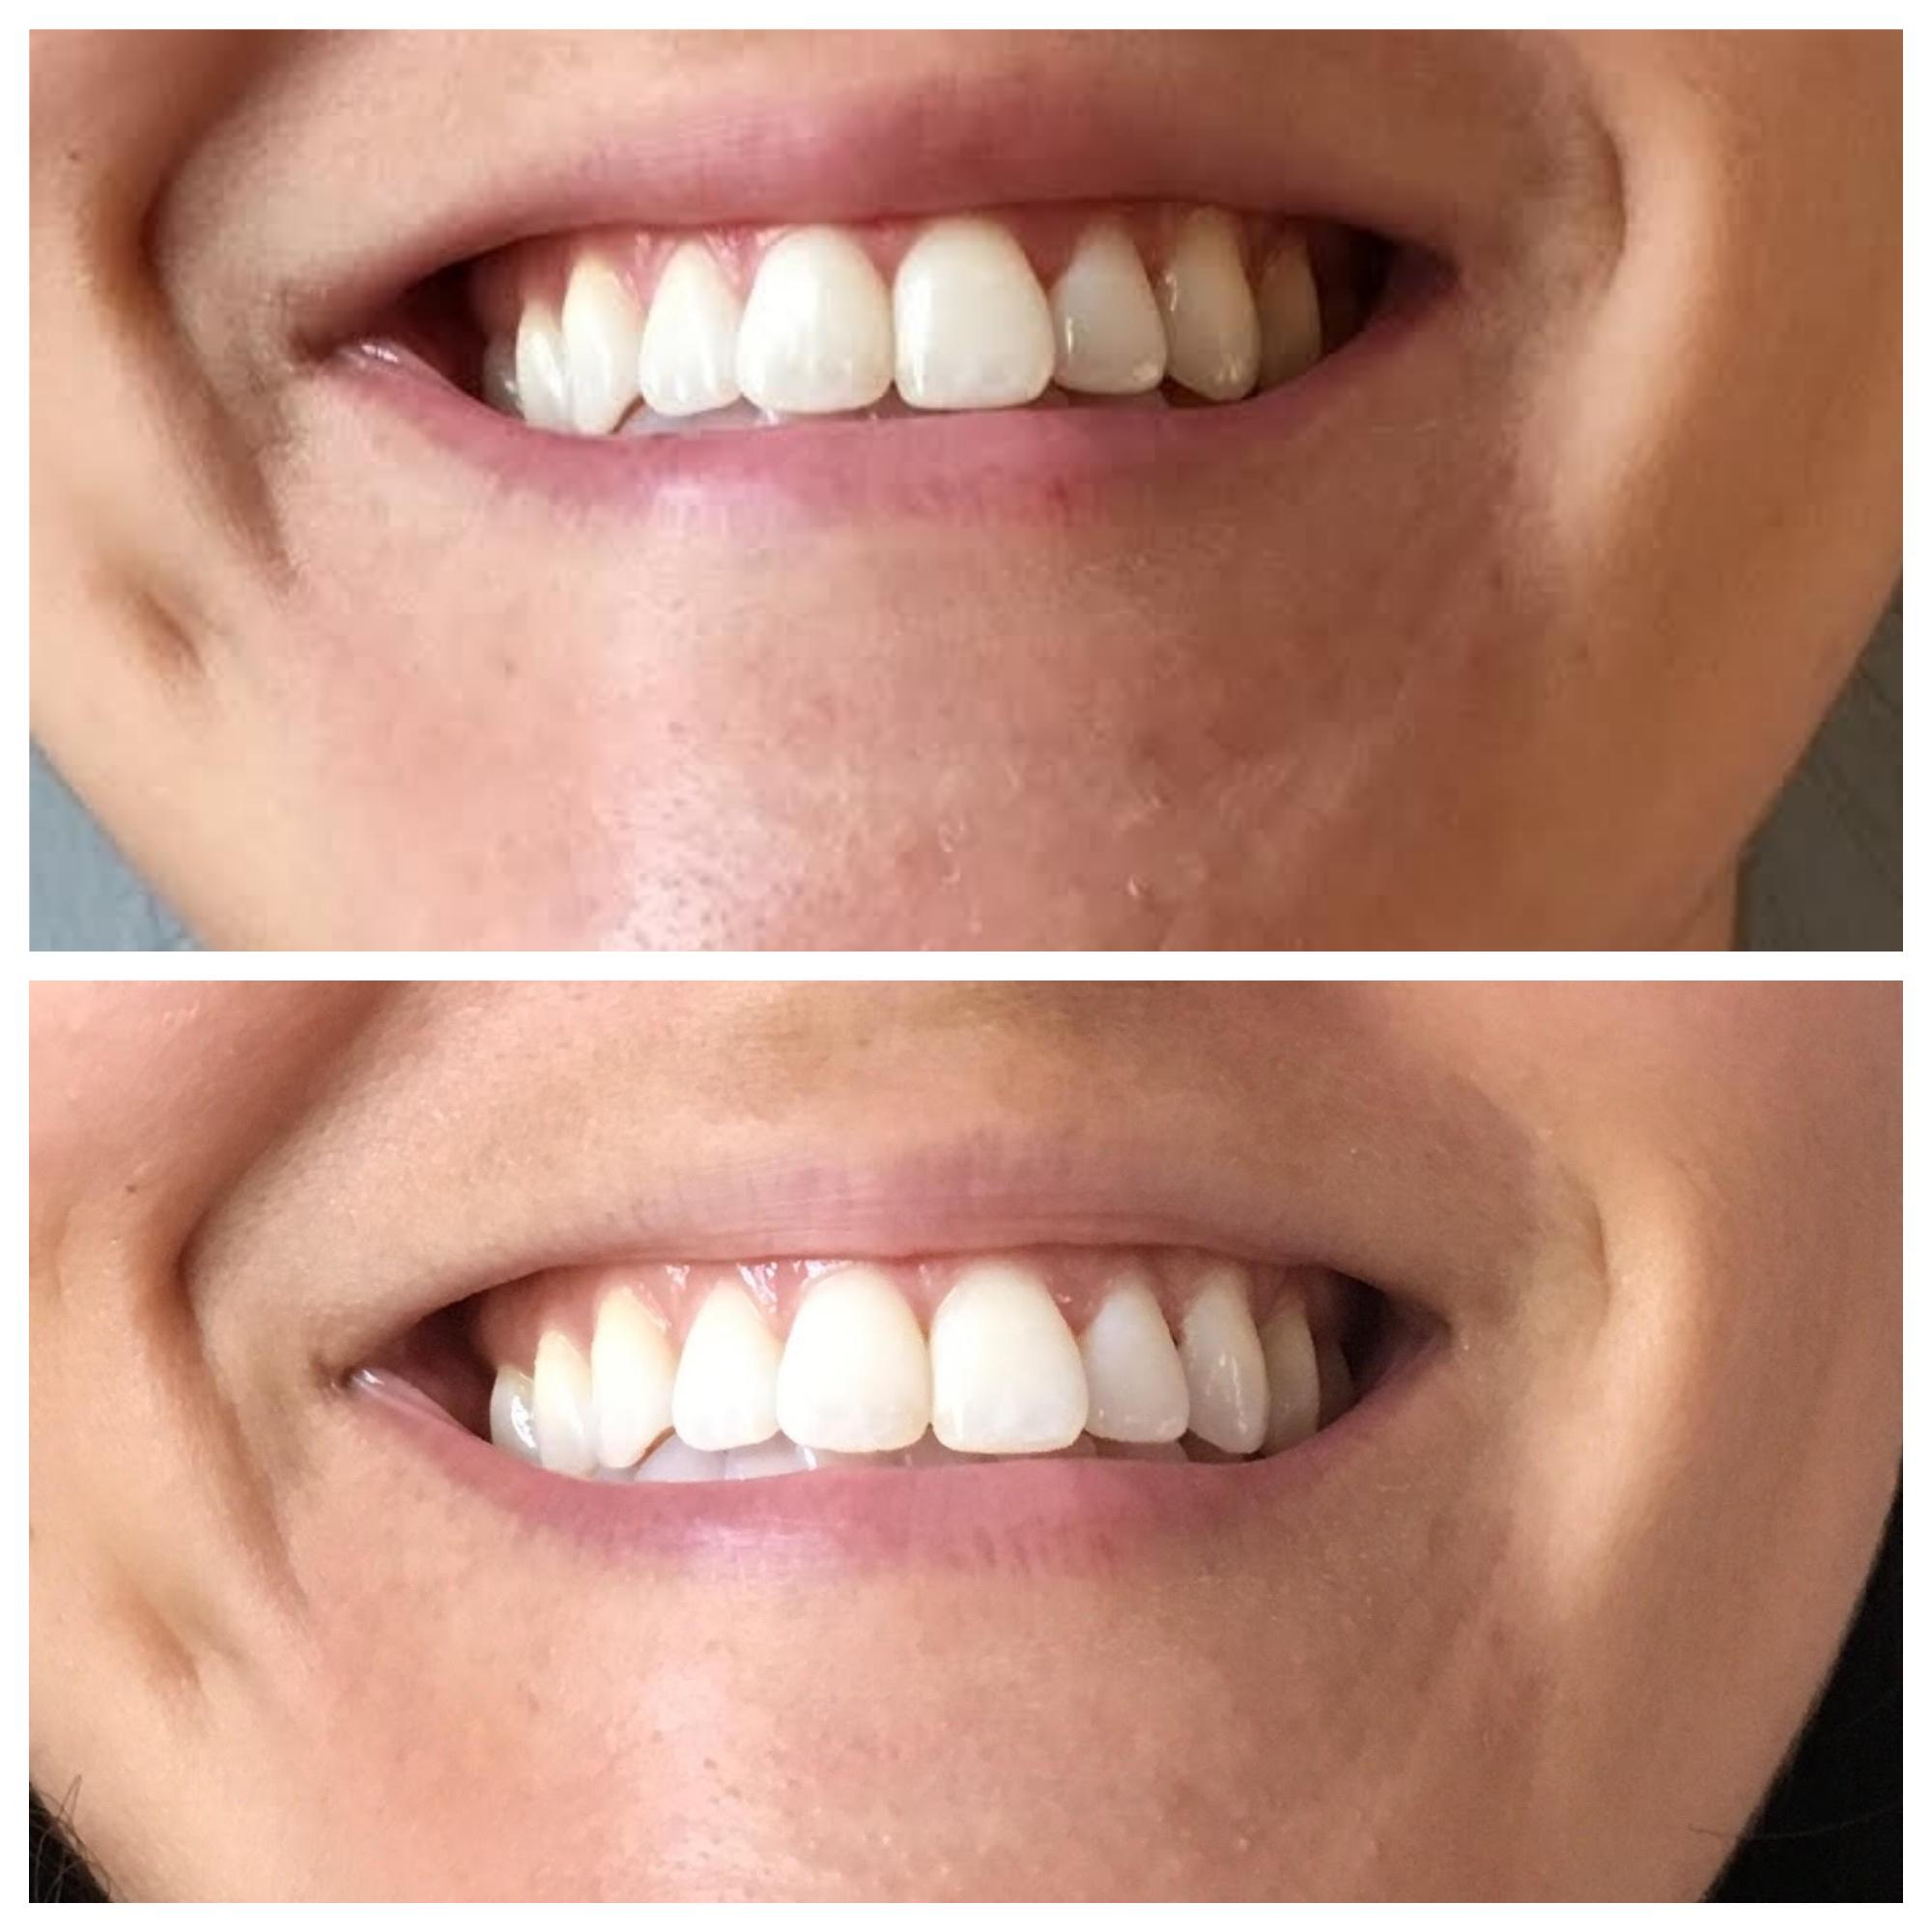 This whitening method saved me $500!! It's insane and it works! #teethwhitening #smile #athometeethwhitening